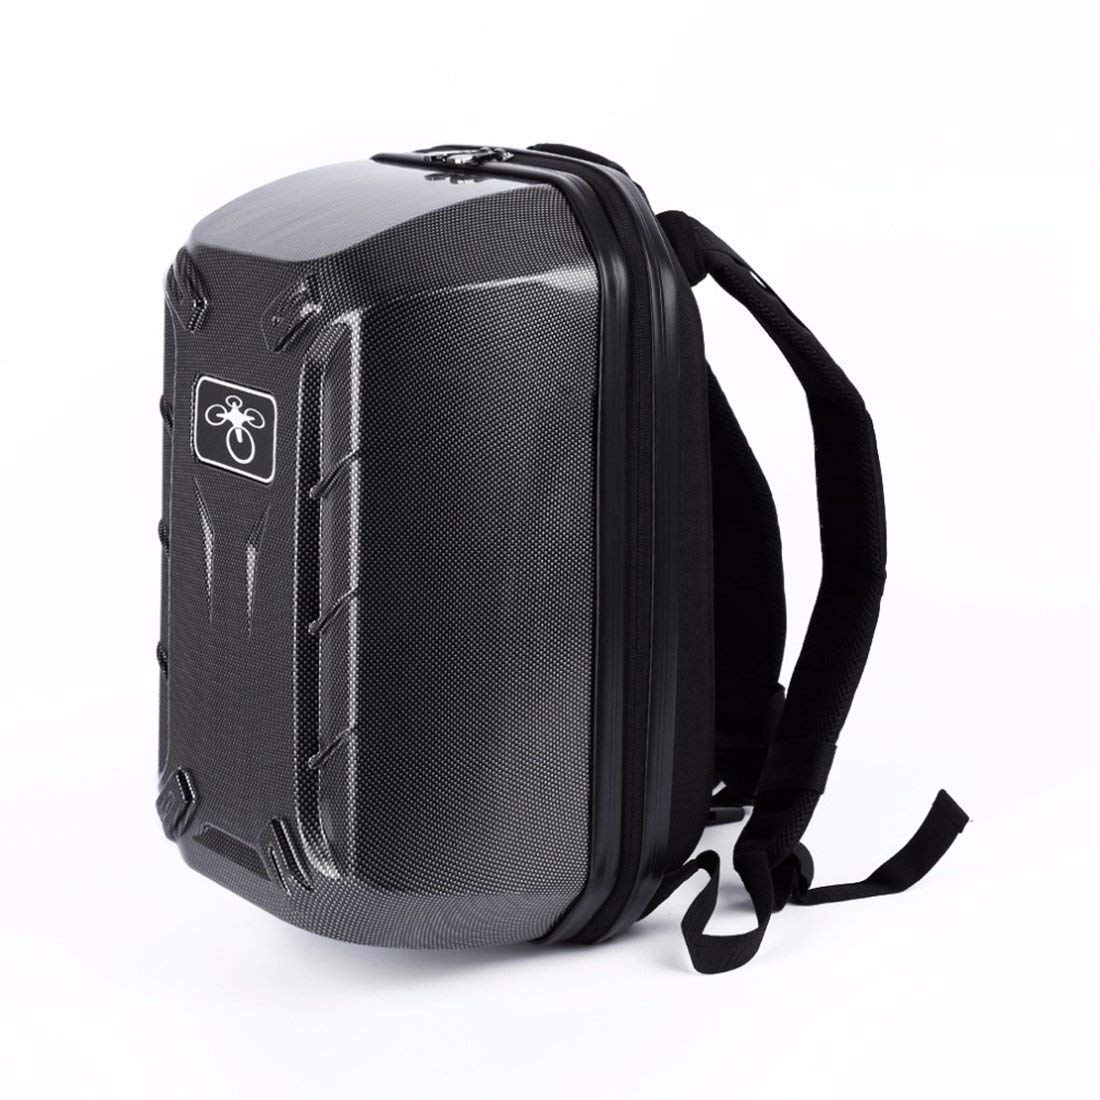 Albert DJI Phantom 3/4 Backpack Case Bag Waterproof Travel Shoulder Bag Hardshell Turtle Shell Backpack Universal for Phantom 3/4 Drone and Accessories